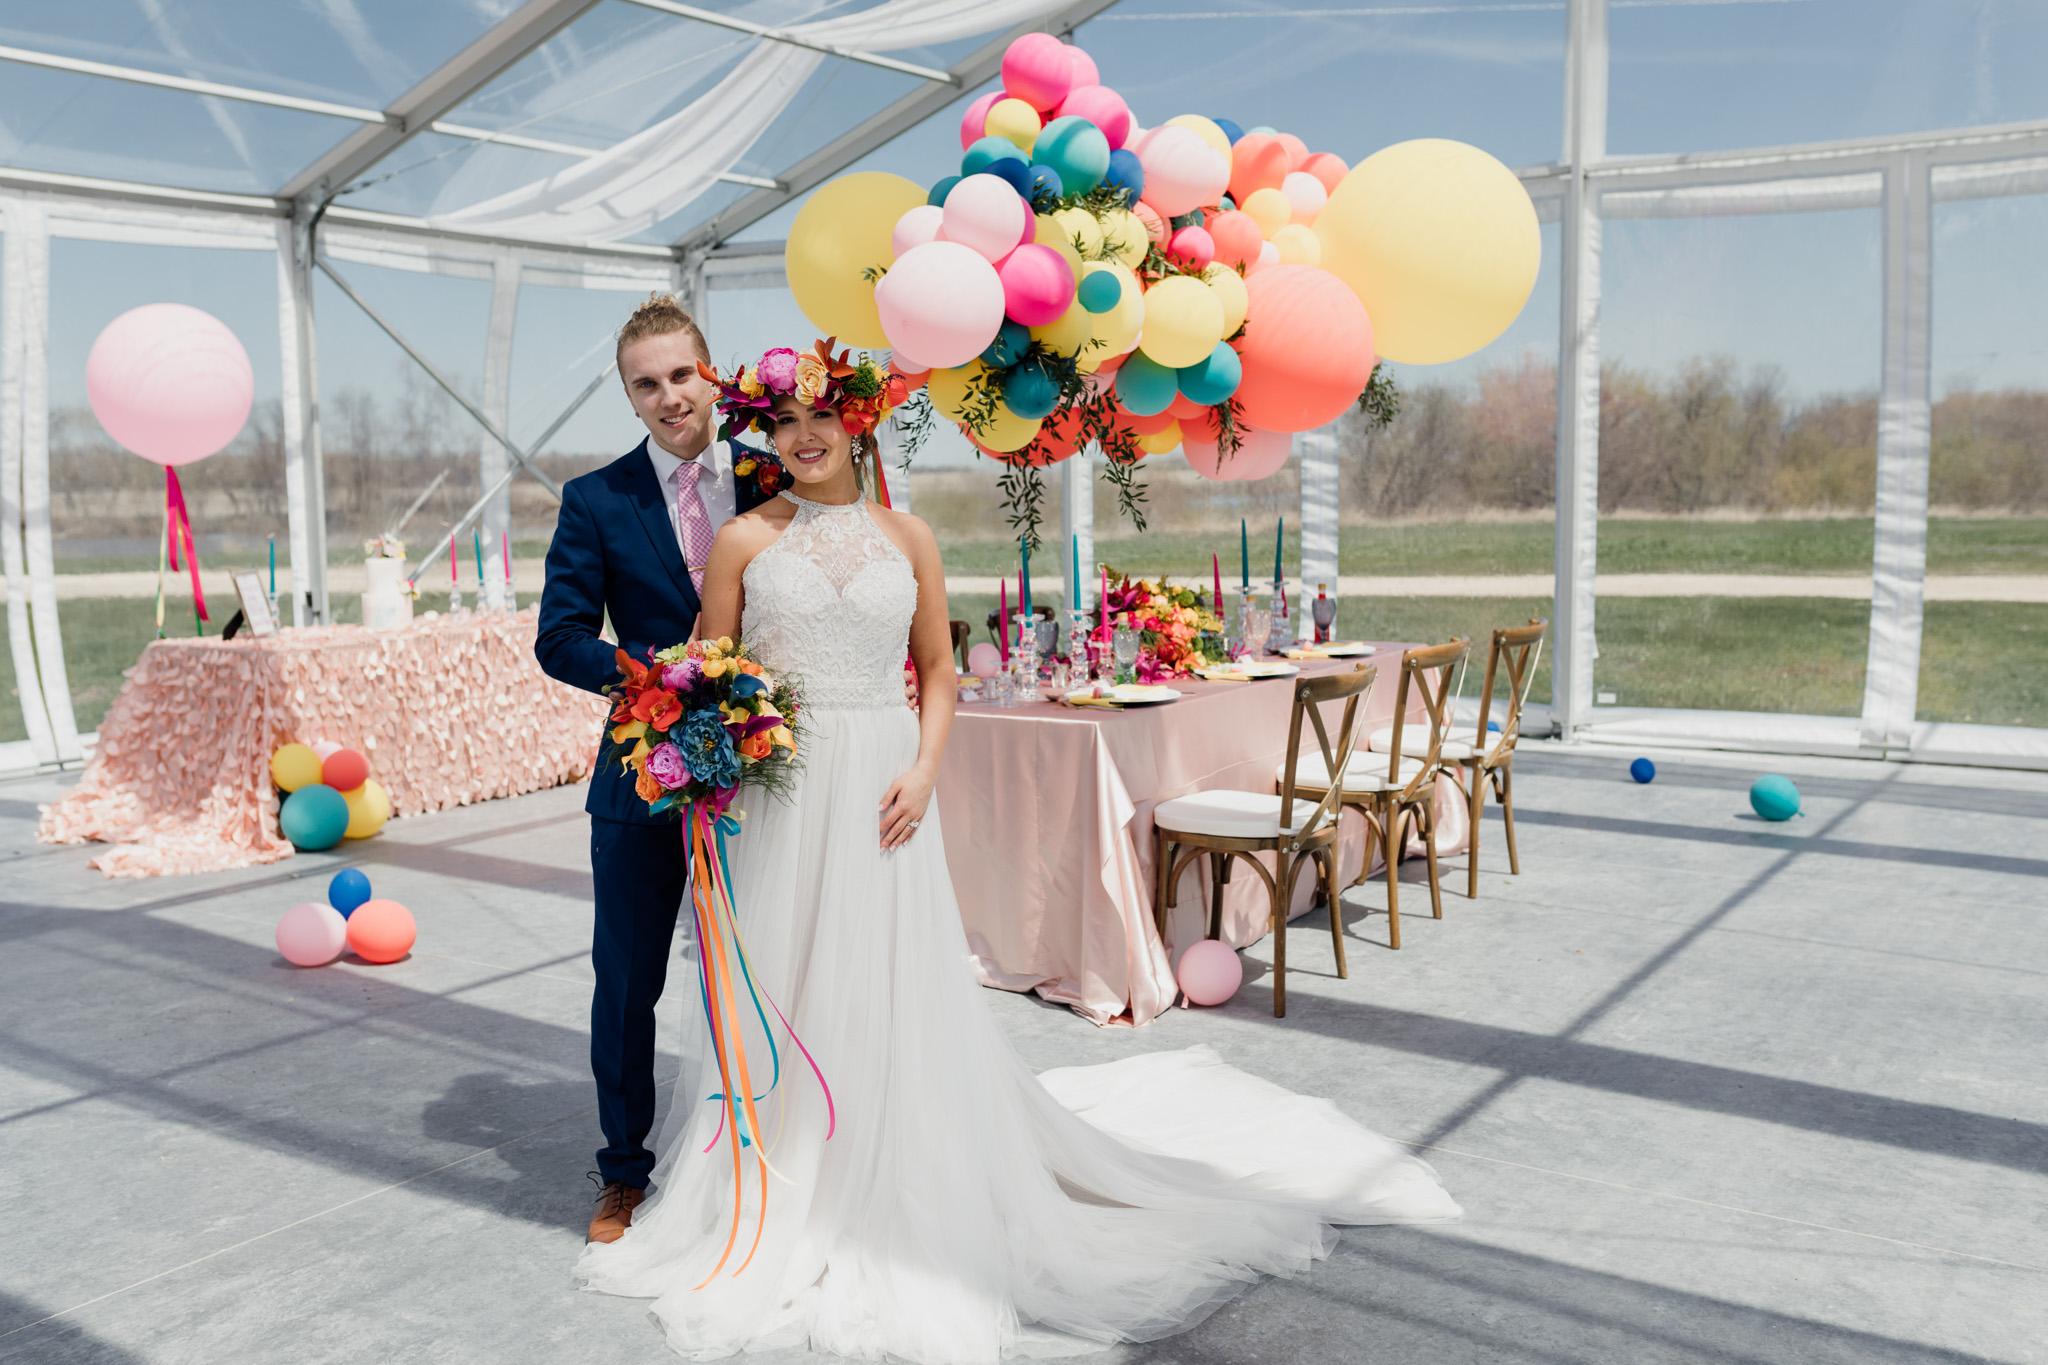 winnipeg-wedding-starlit point-38.jpg